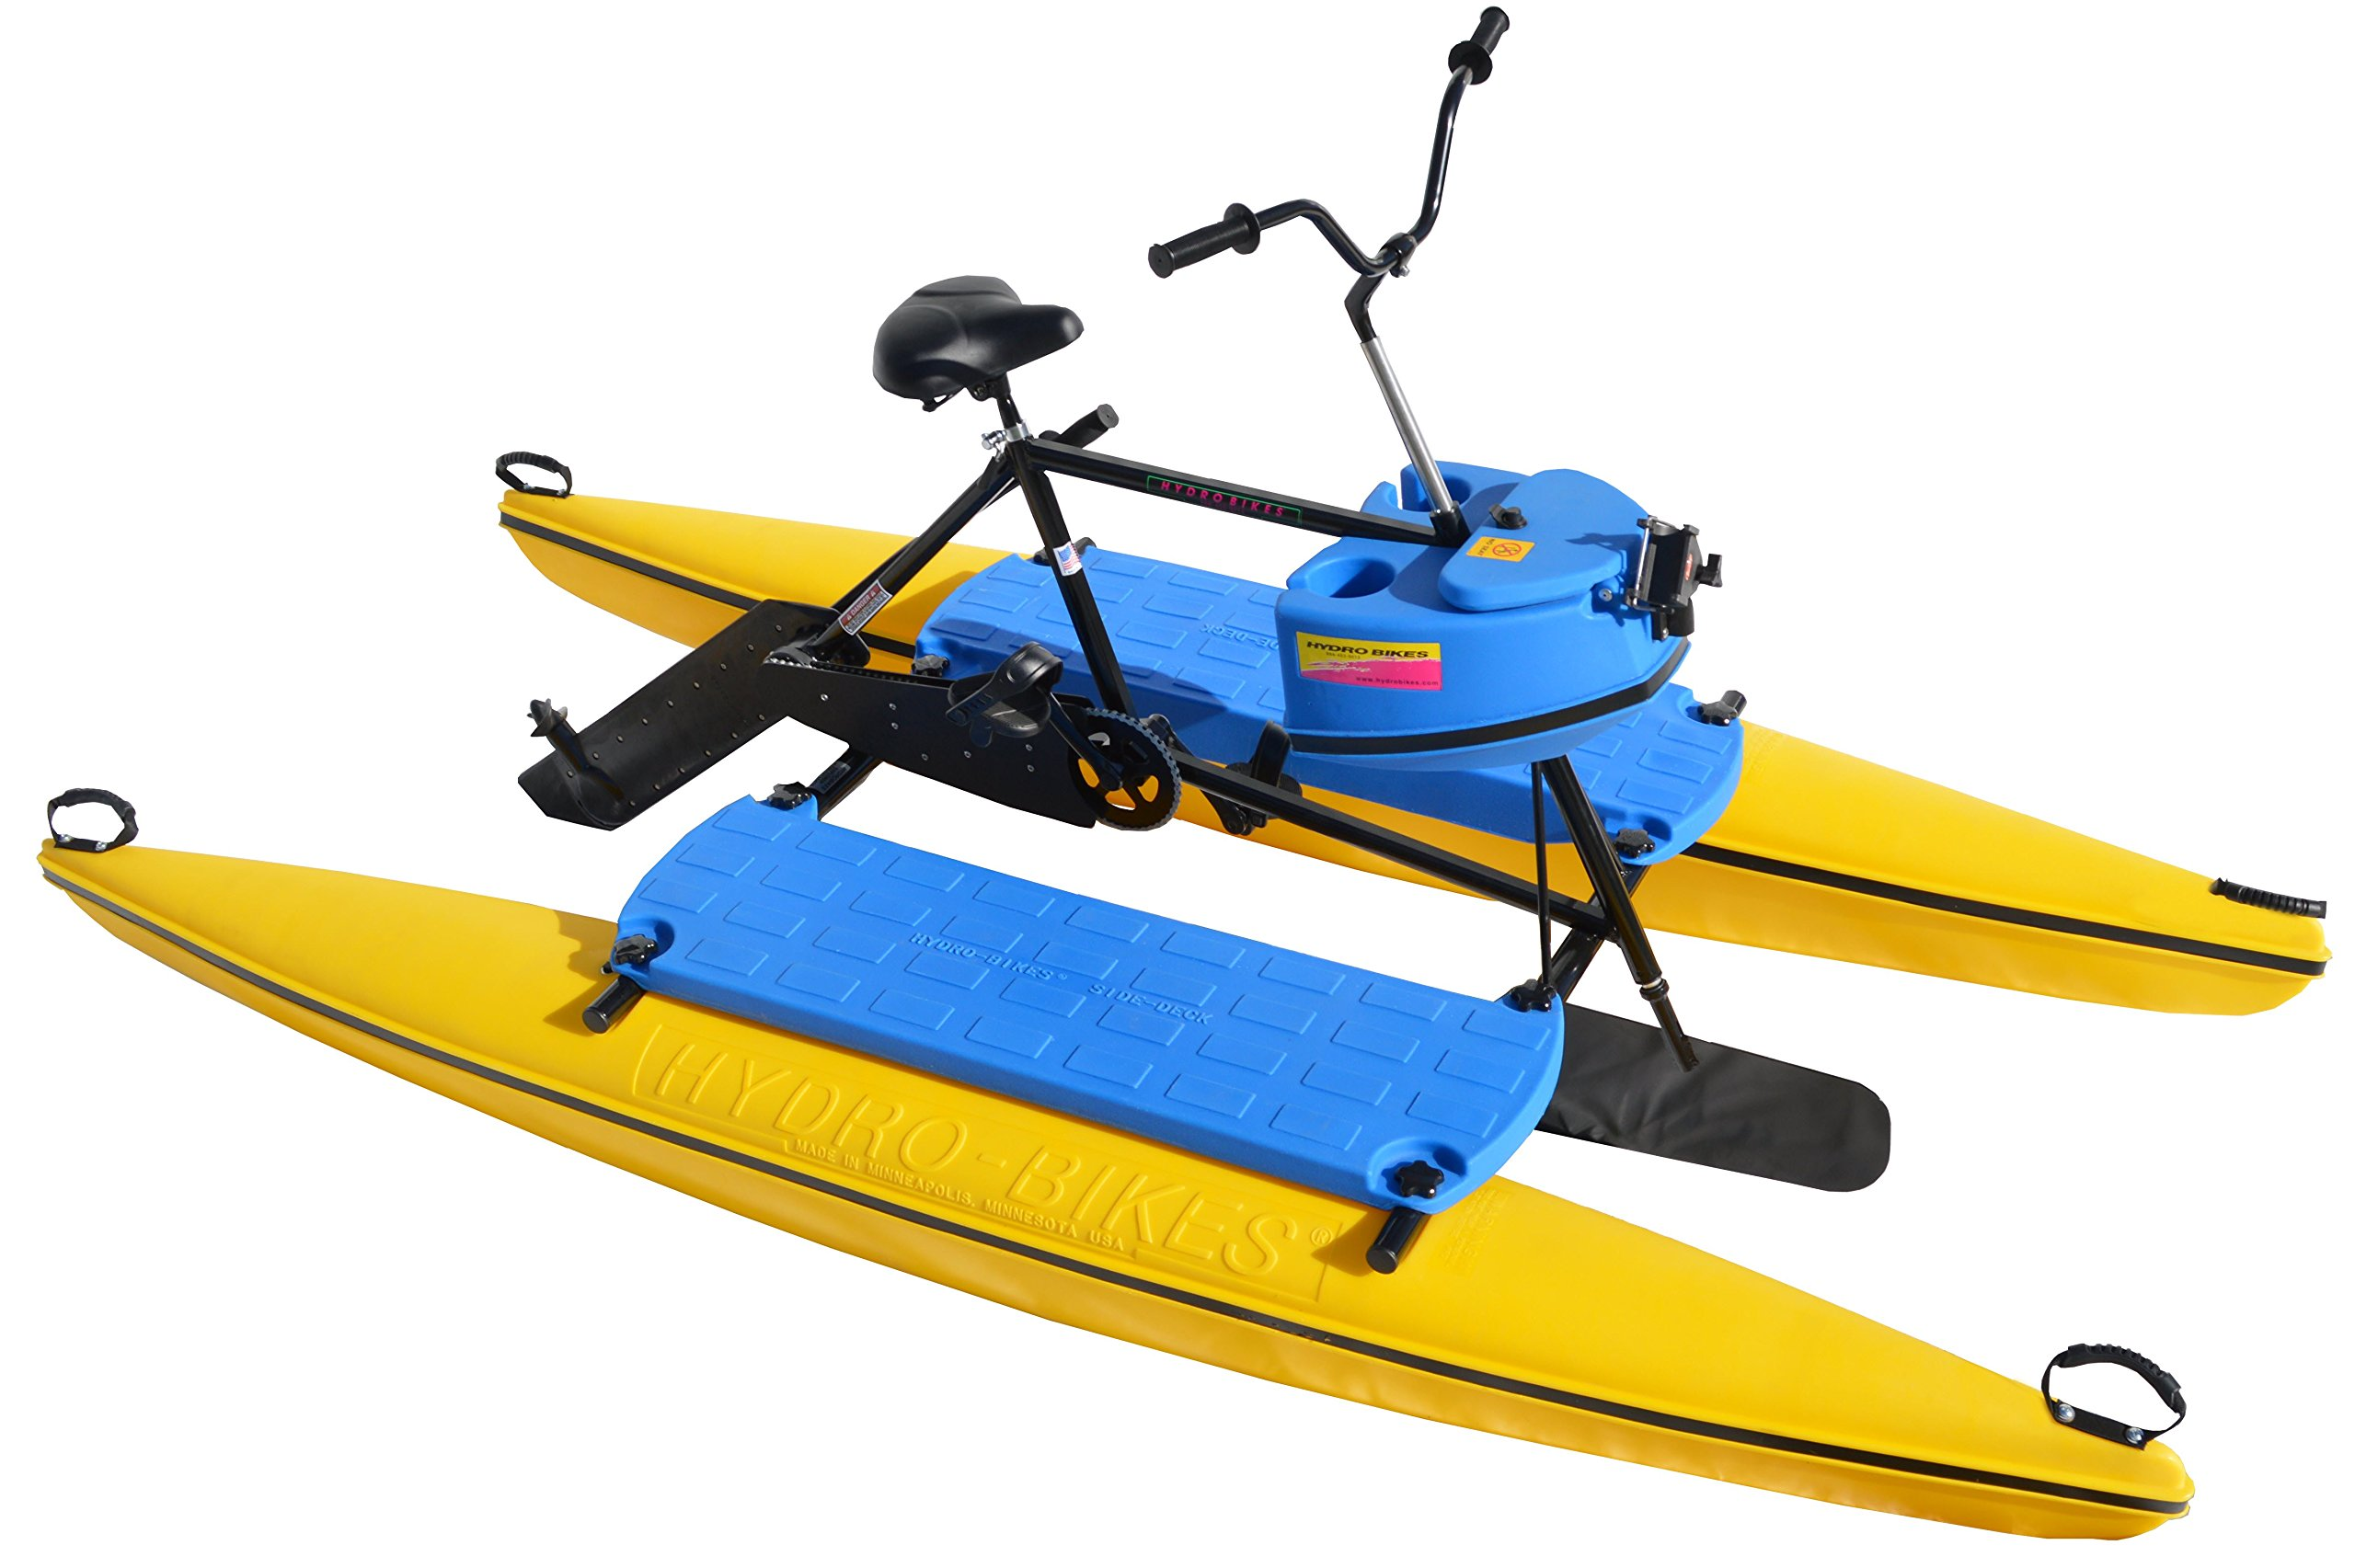 Hydrobike Explorer by Hydrobikes